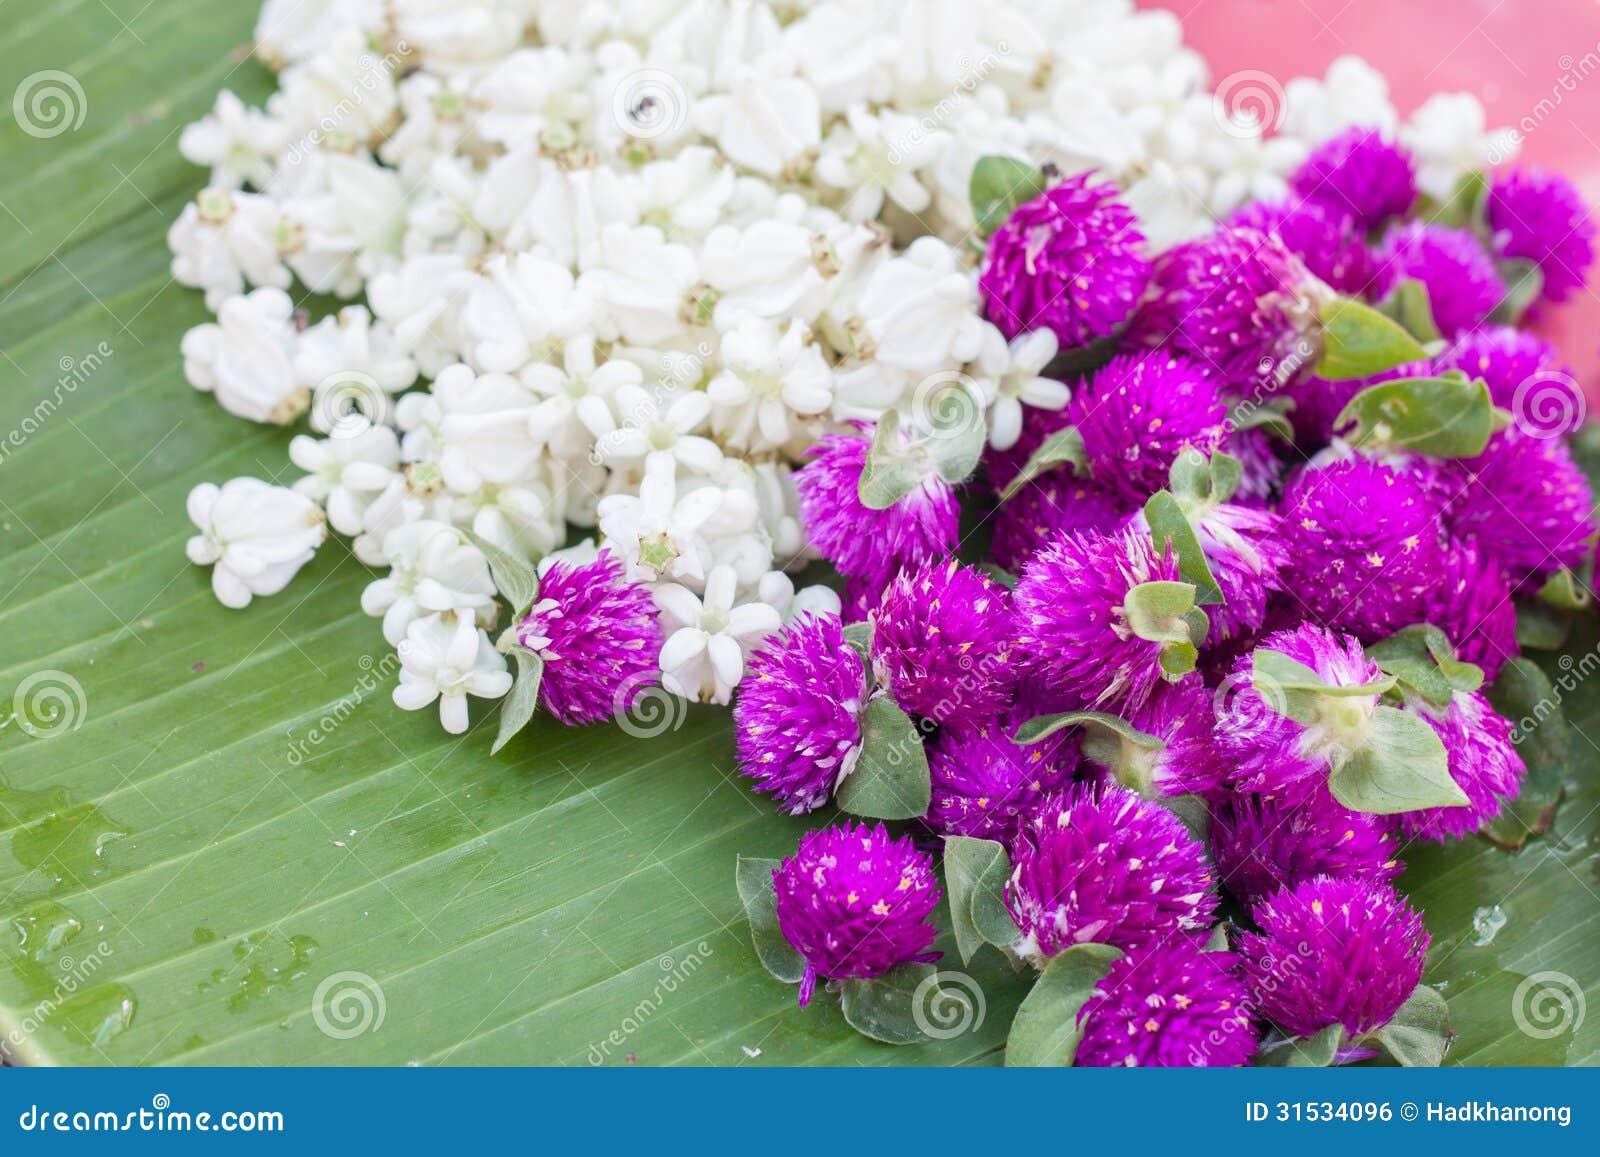 The pile of jasmine and globe amaranth flower stock photo image of the pile of jasmine and globe amaranth flower izmirmasajfo